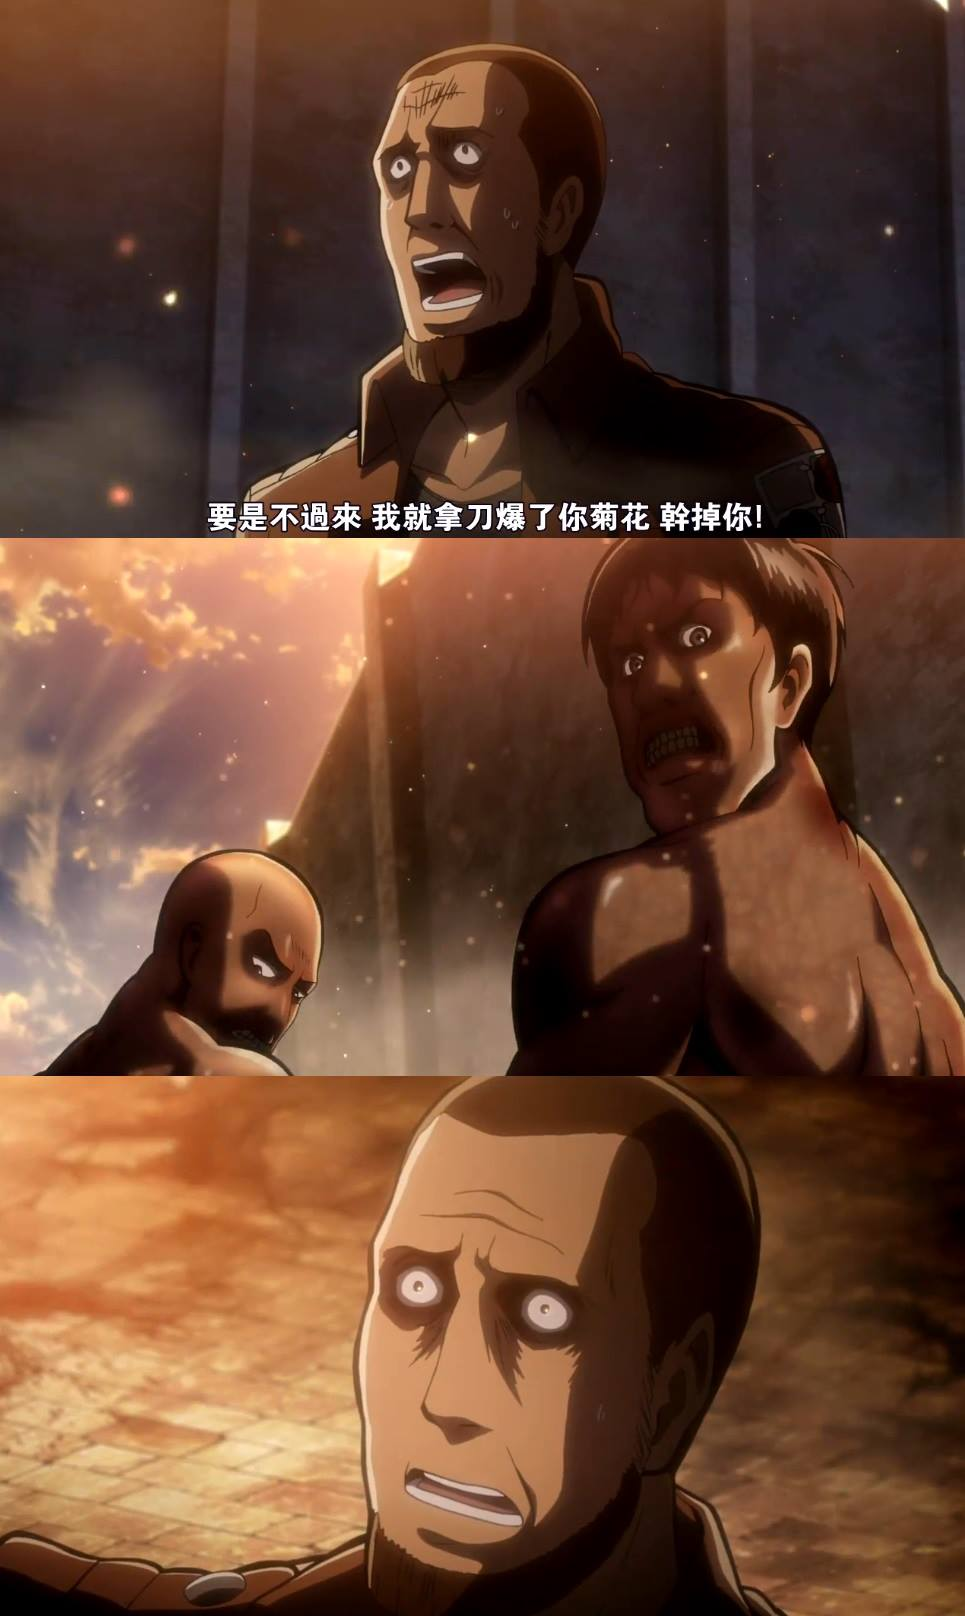 attack on titan 進擊的巨人 13集